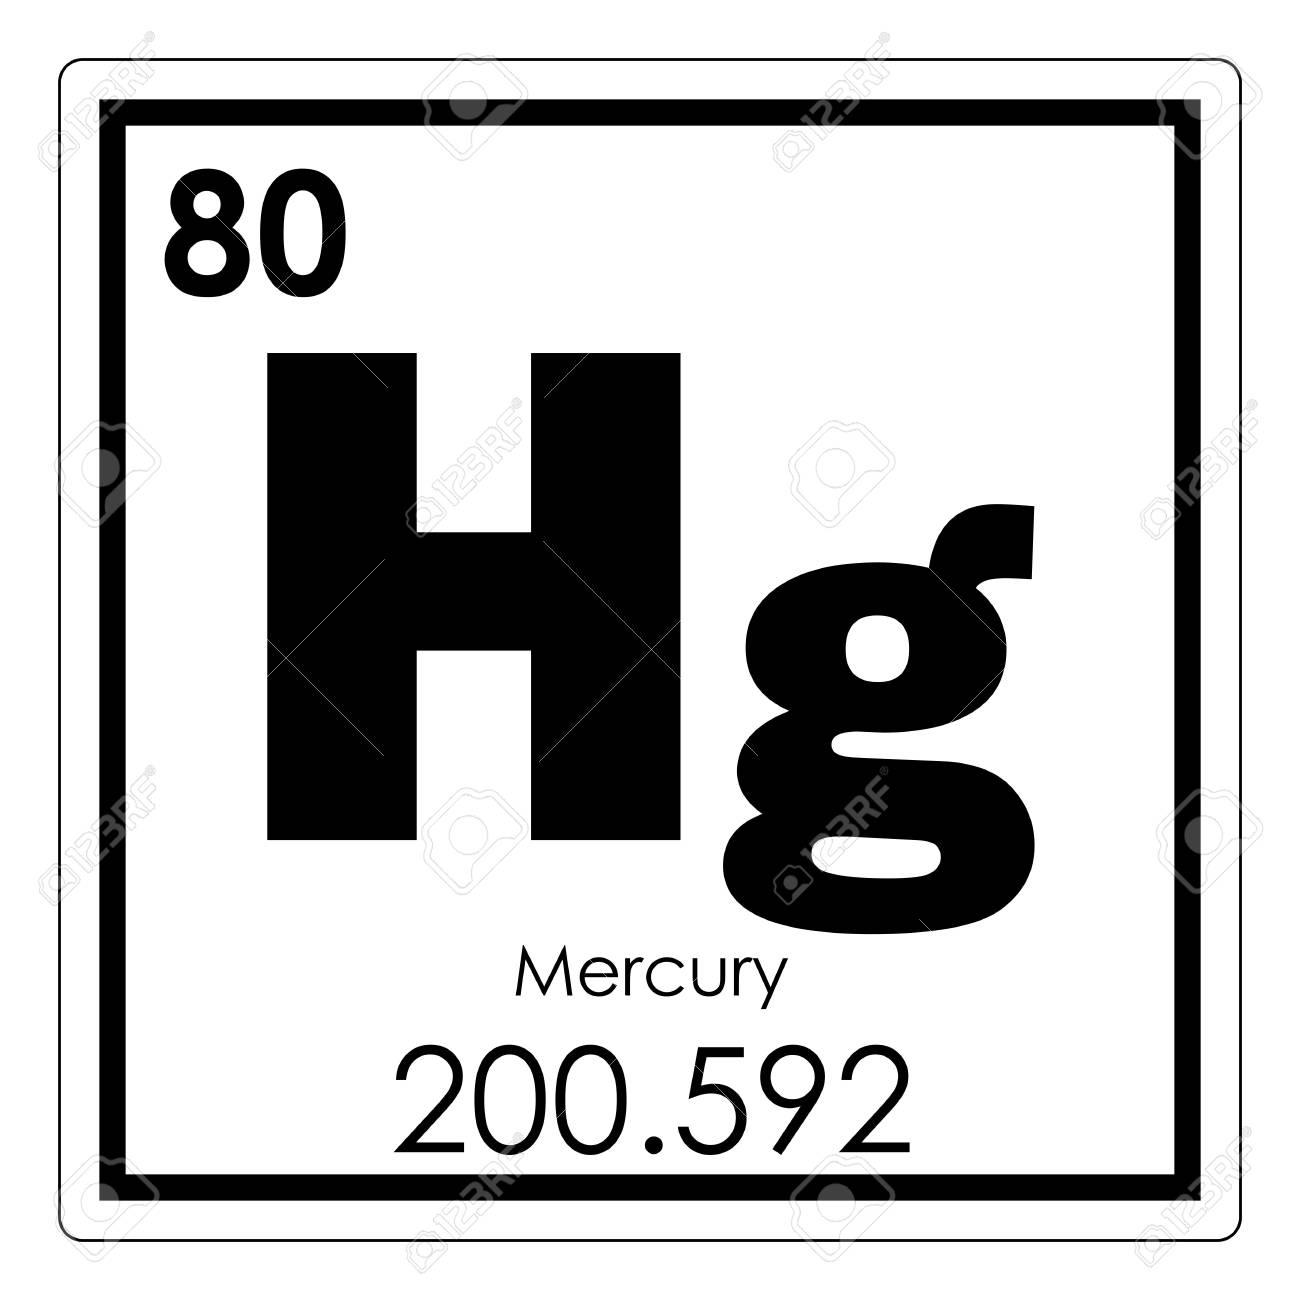 93545724-mercury-chemical-element-periodic-table-science-symbol.jpg